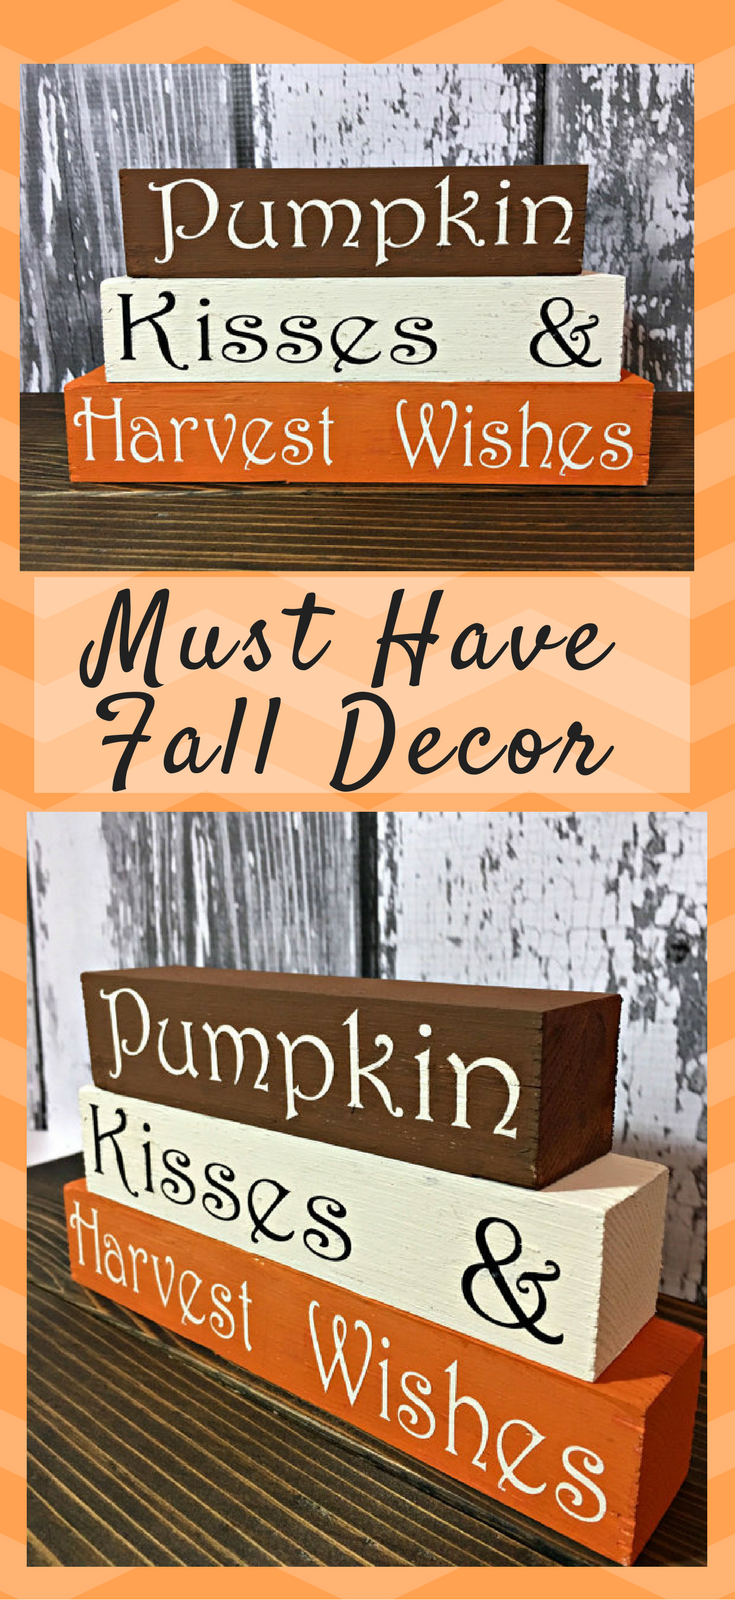 Window decor and more orange beach  pumpkin kisses u harvest wishes shelf sitters fall ad pumpkin